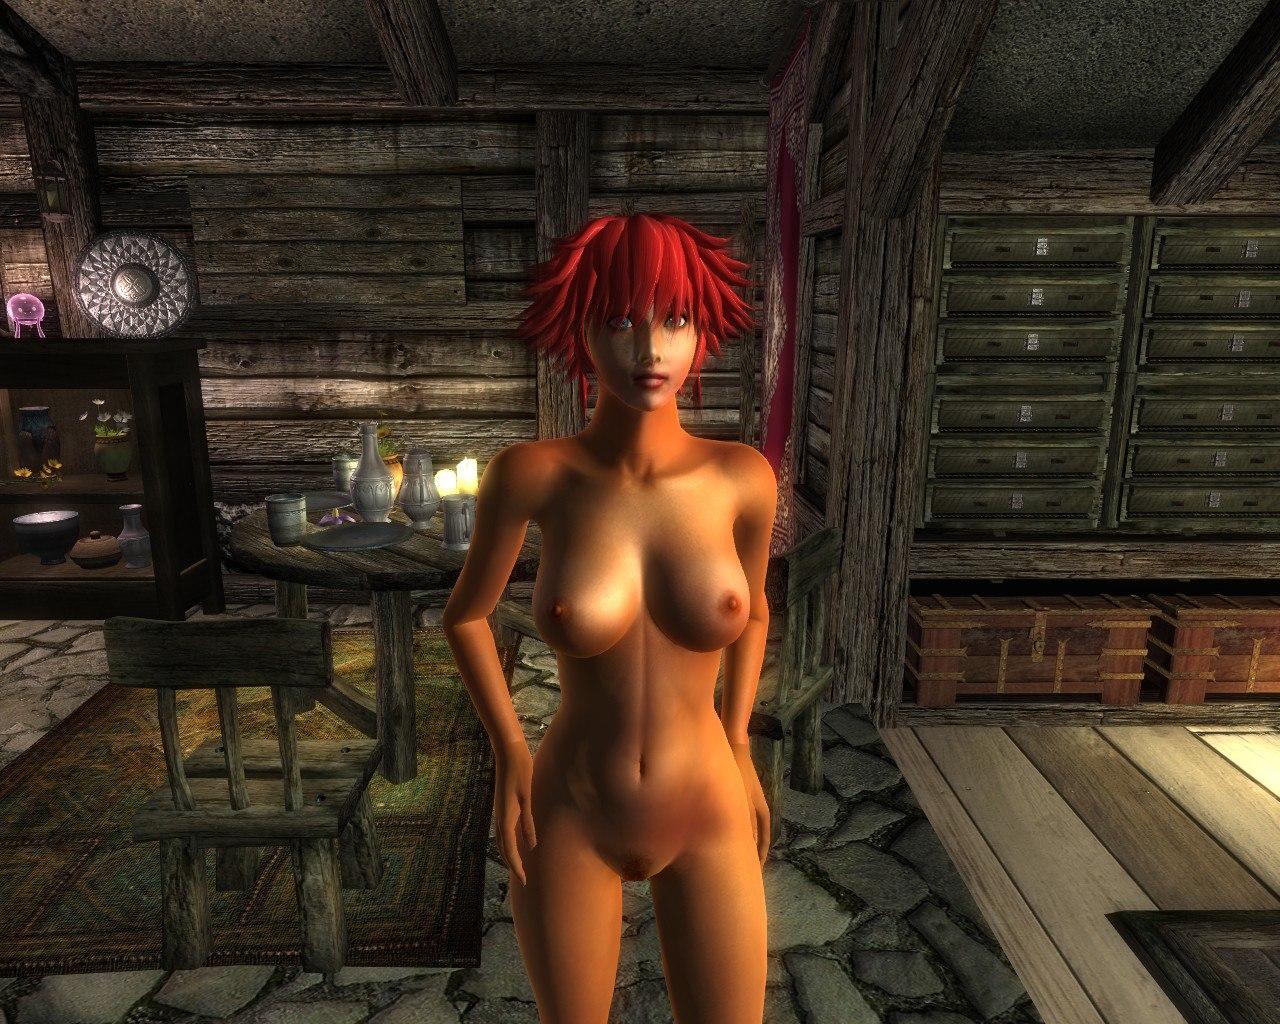 Media tumblr com tumblr m ahsfcs f ref m o hot nude